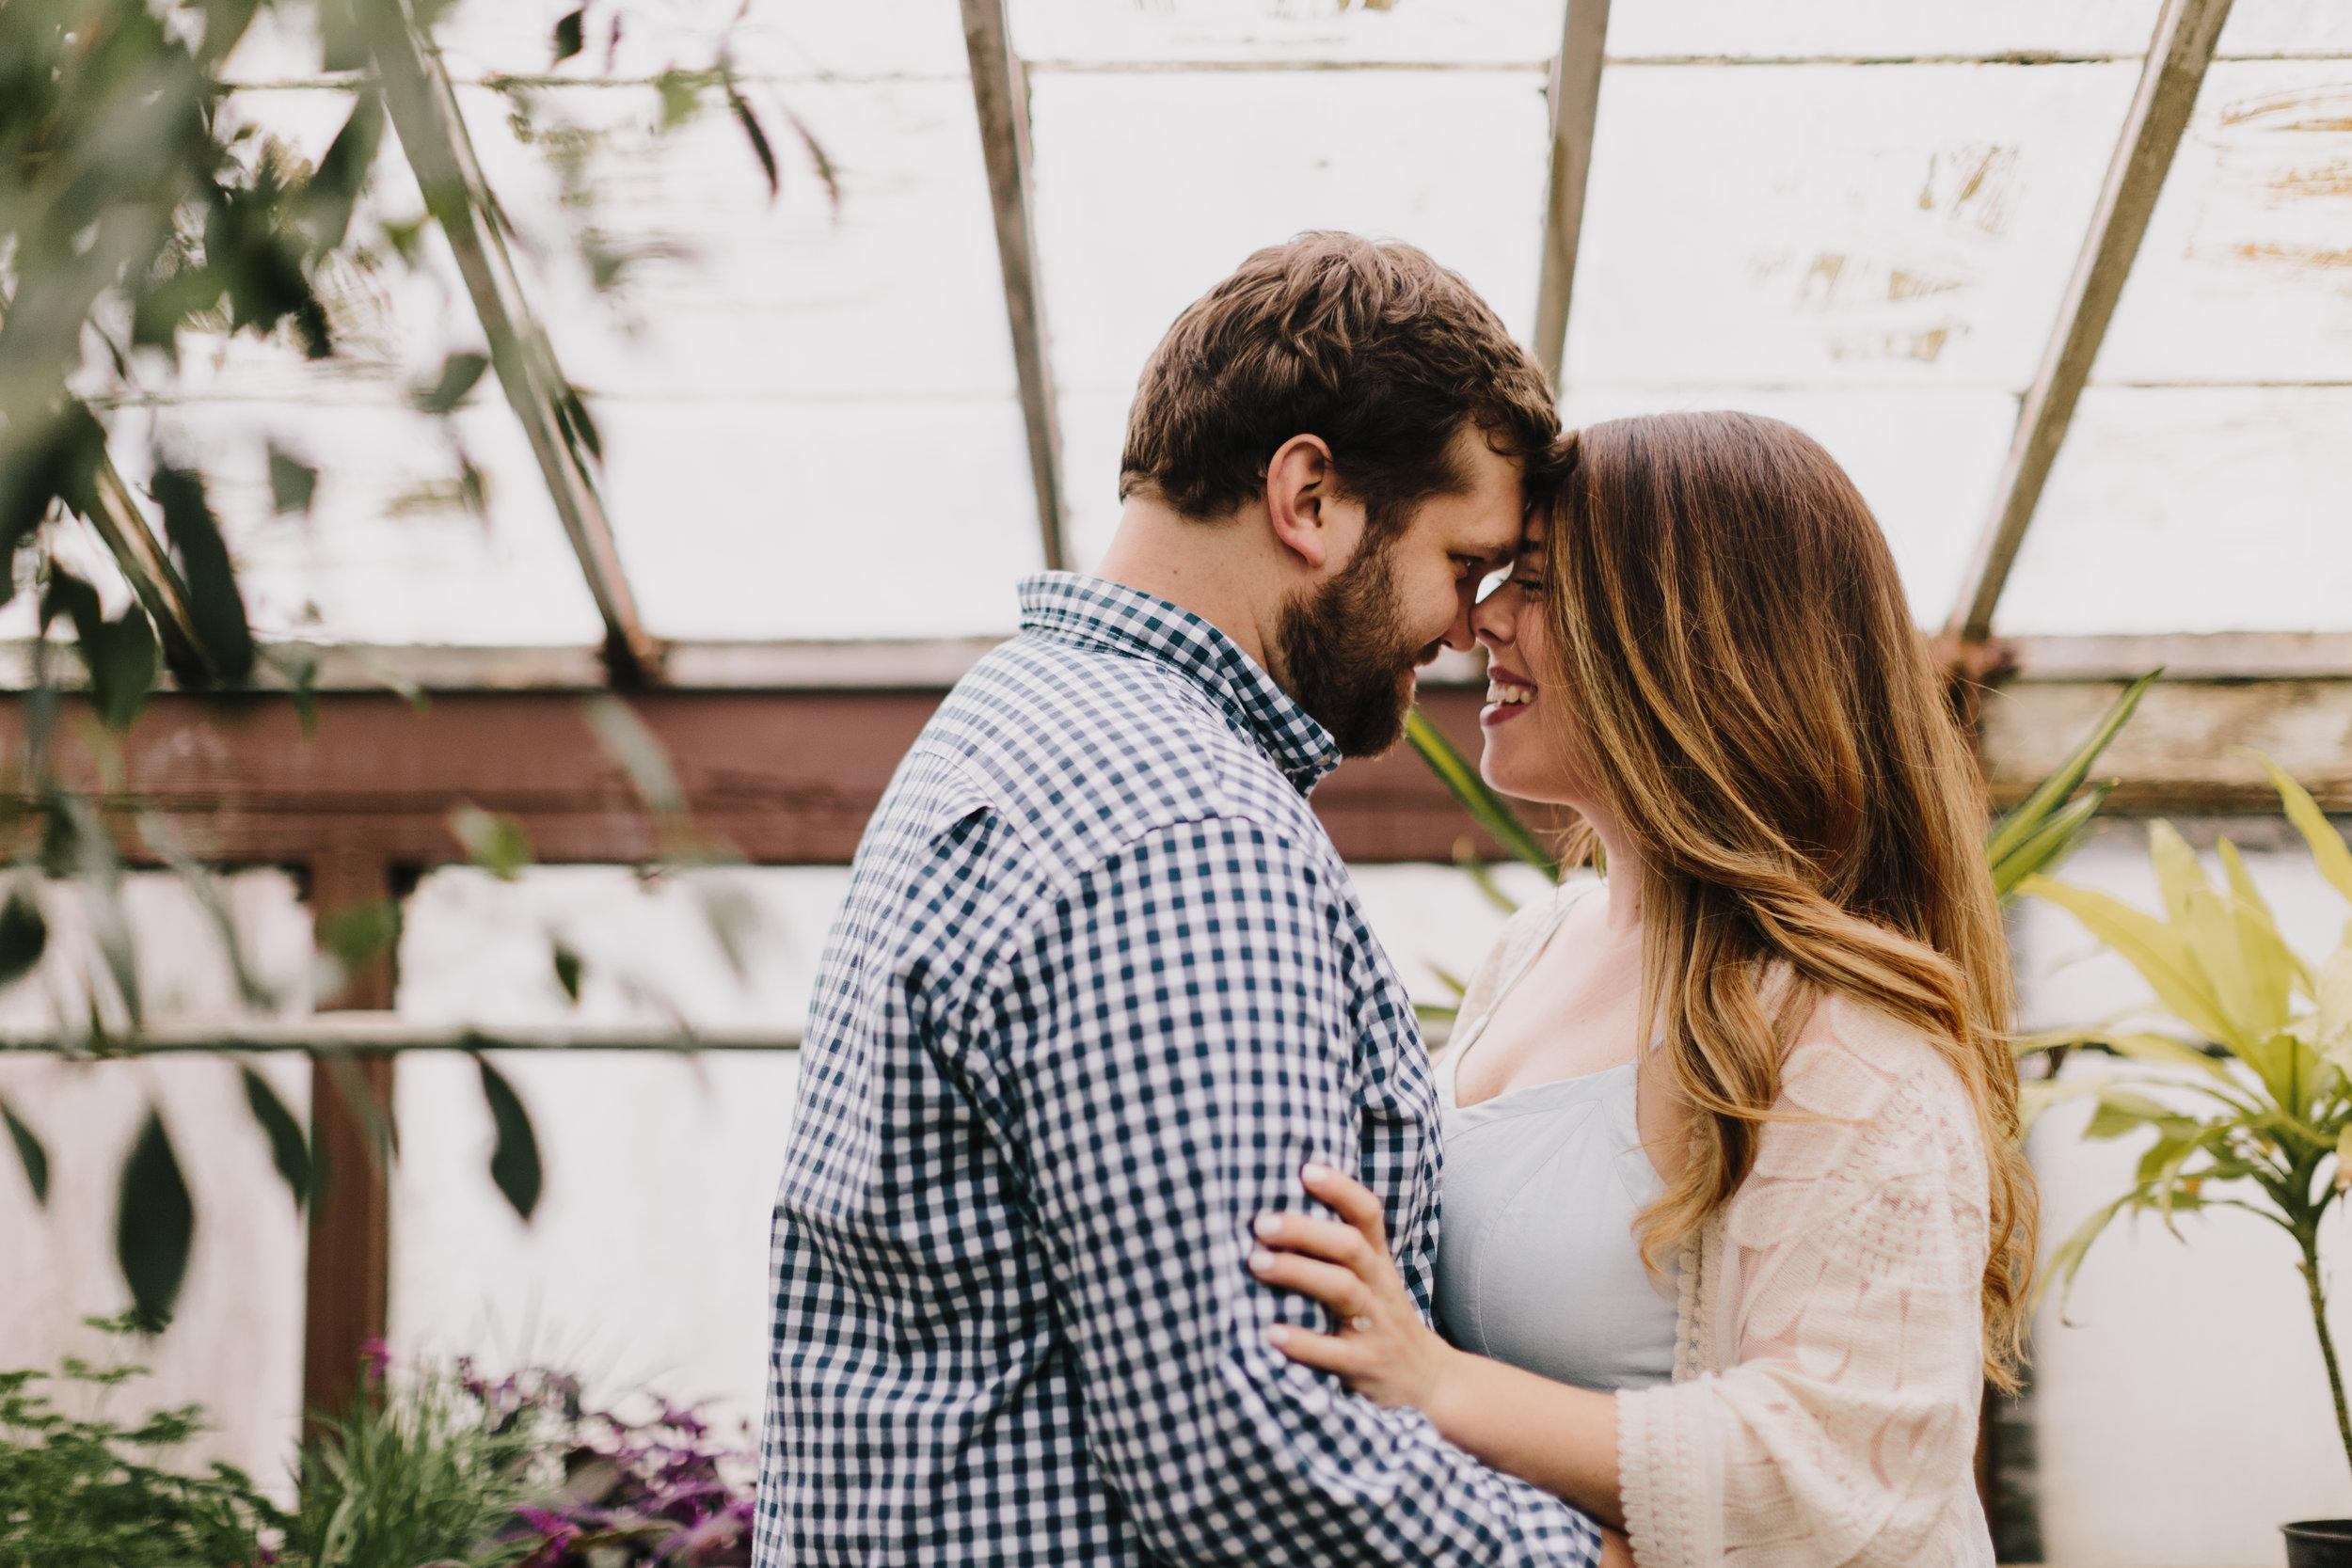 alyssa barletter photography greenhouse engagement photographer kansas city spring wedding-6.jpg